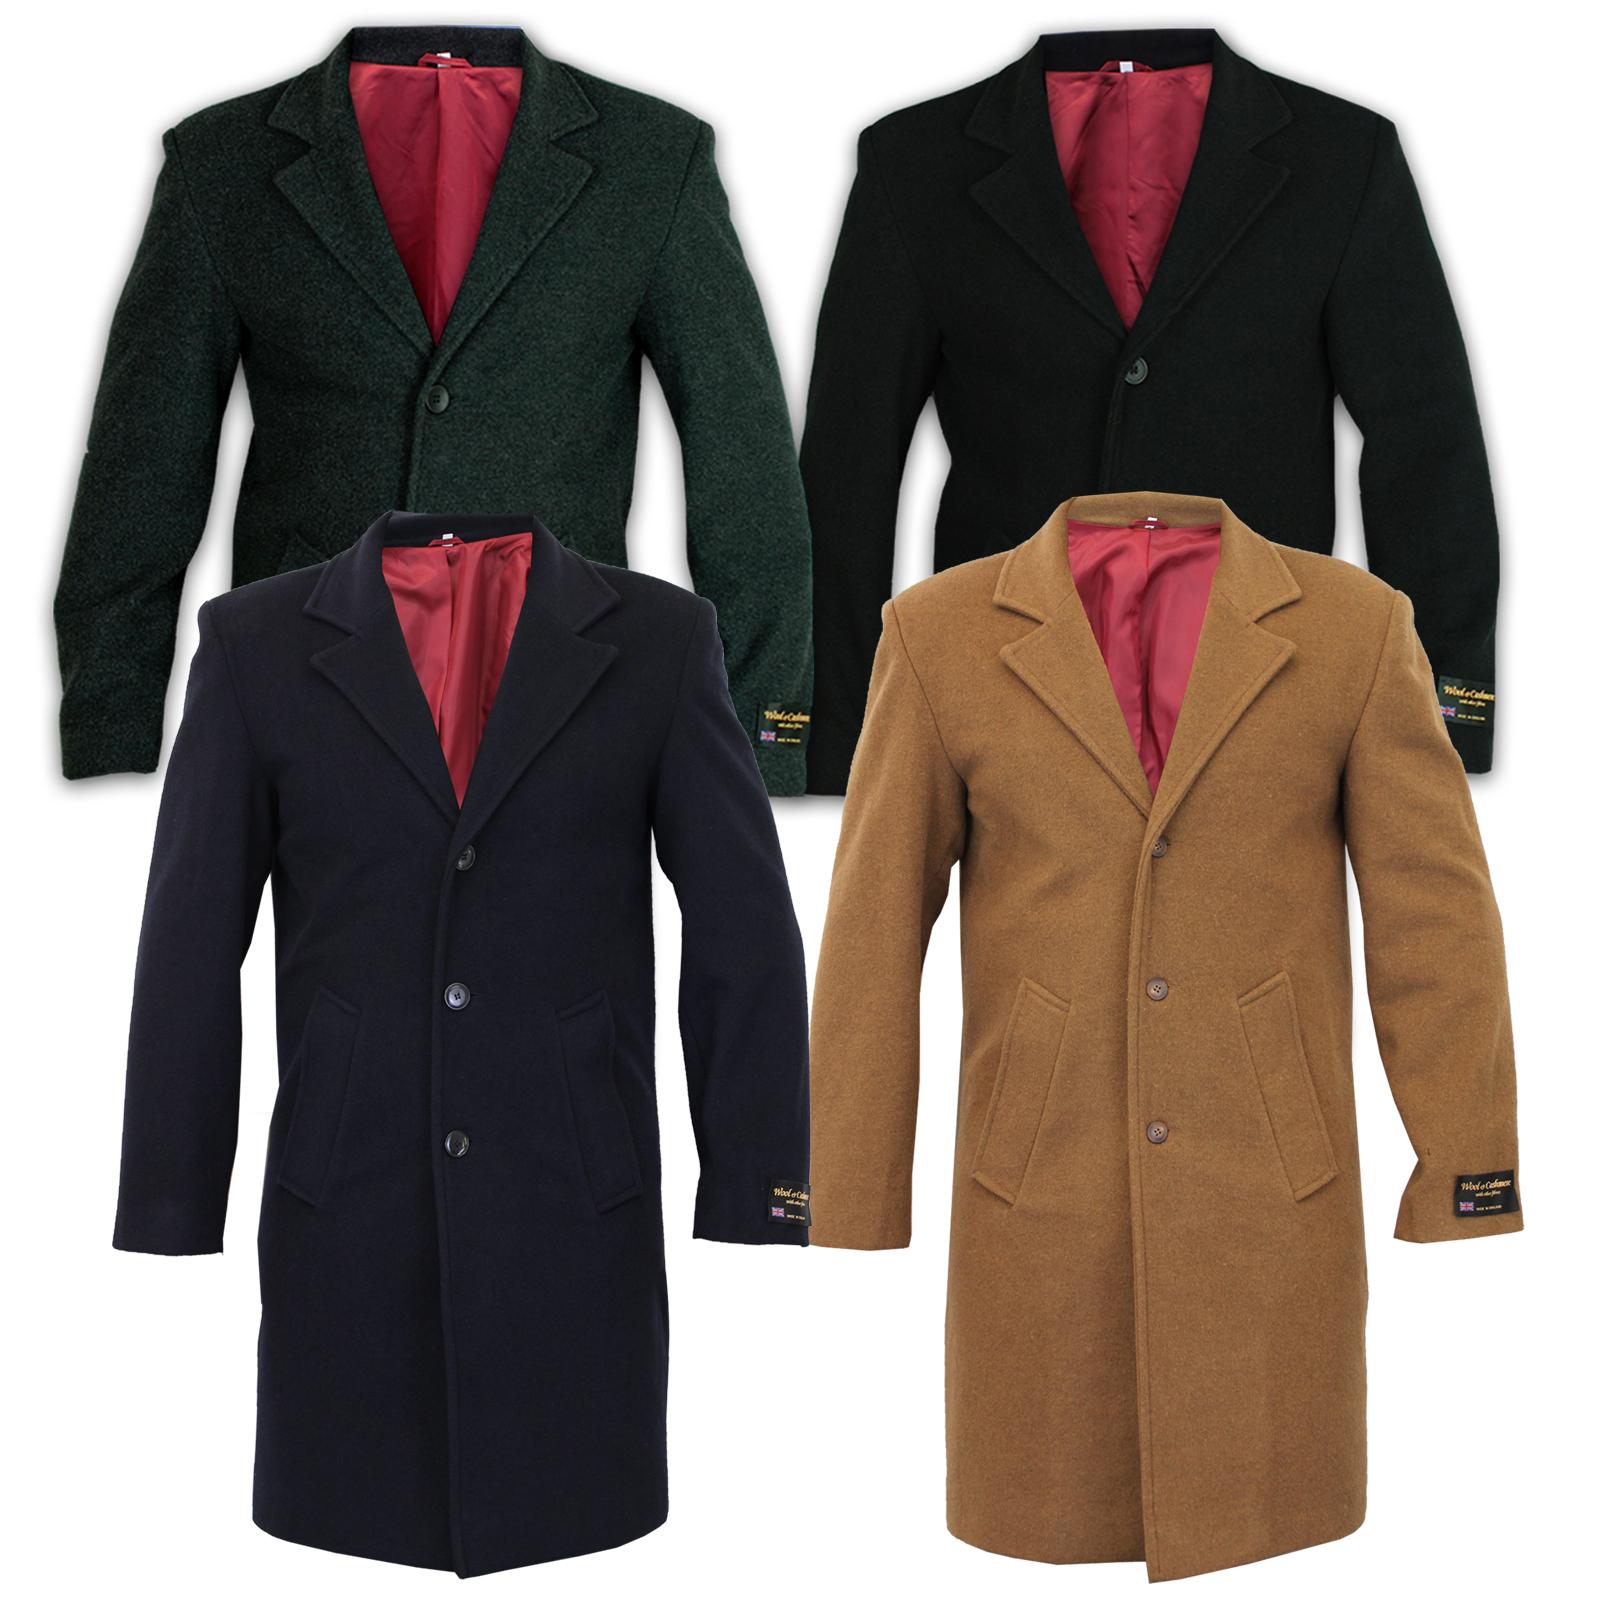 herren wolle kaschmir mantel jacke oberbekleidung grabenzieher warm winter ebay. Black Bedroom Furniture Sets. Home Design Ideas